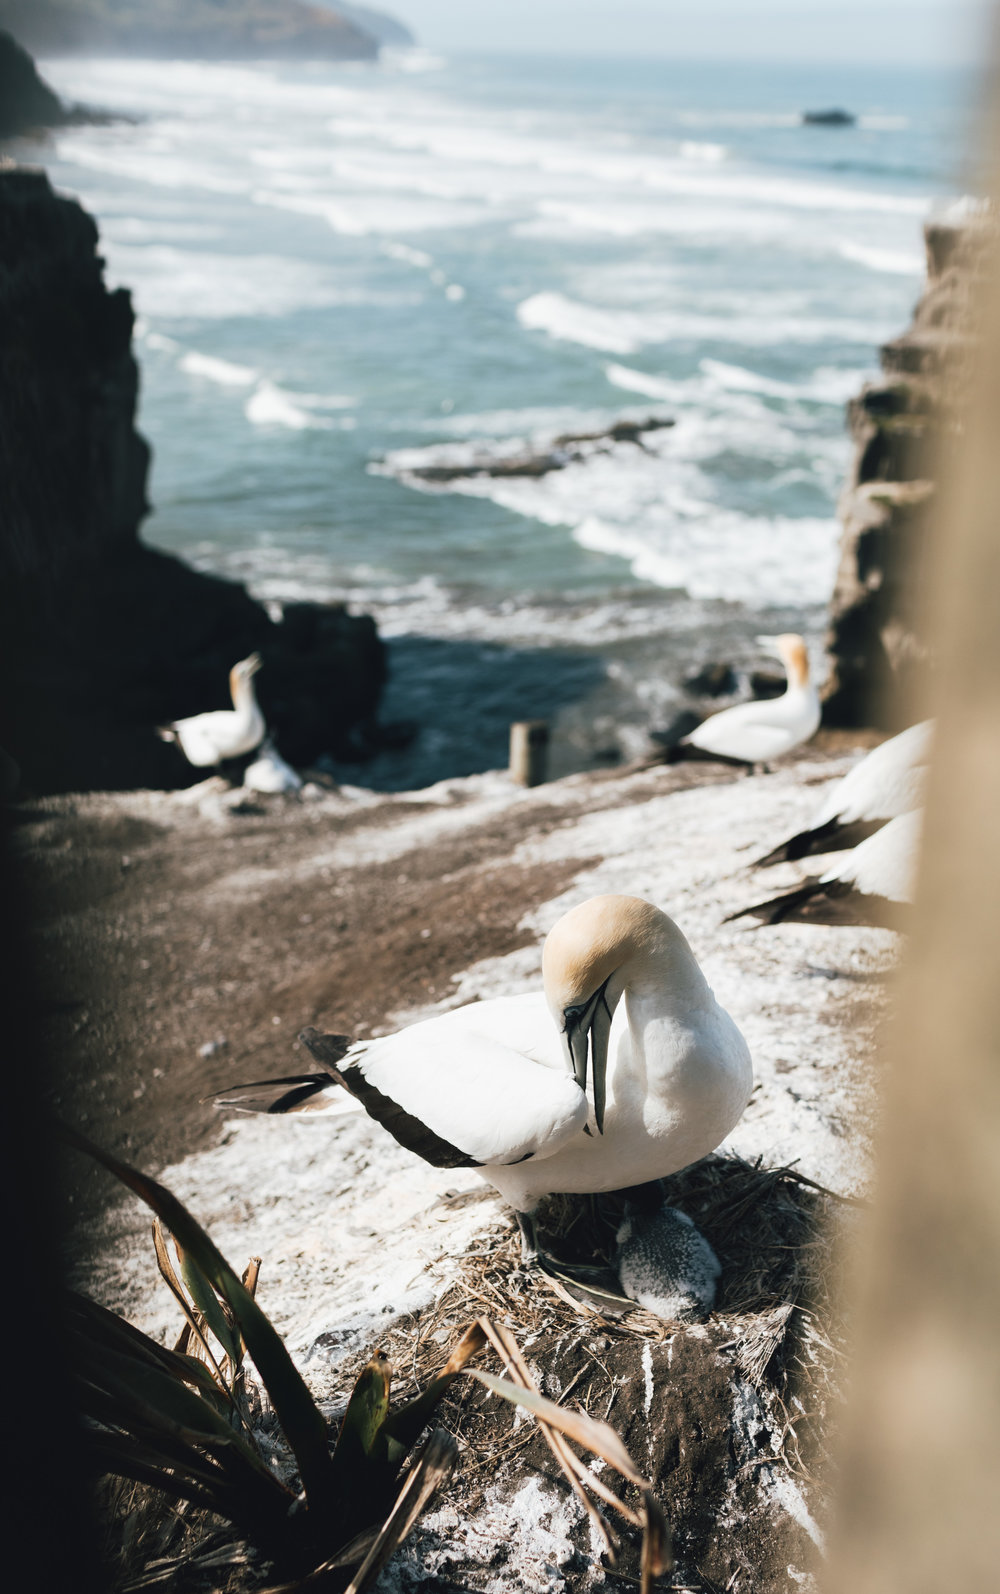 new-zealand-gannet-colony-photo-by-samantha-look.jpg